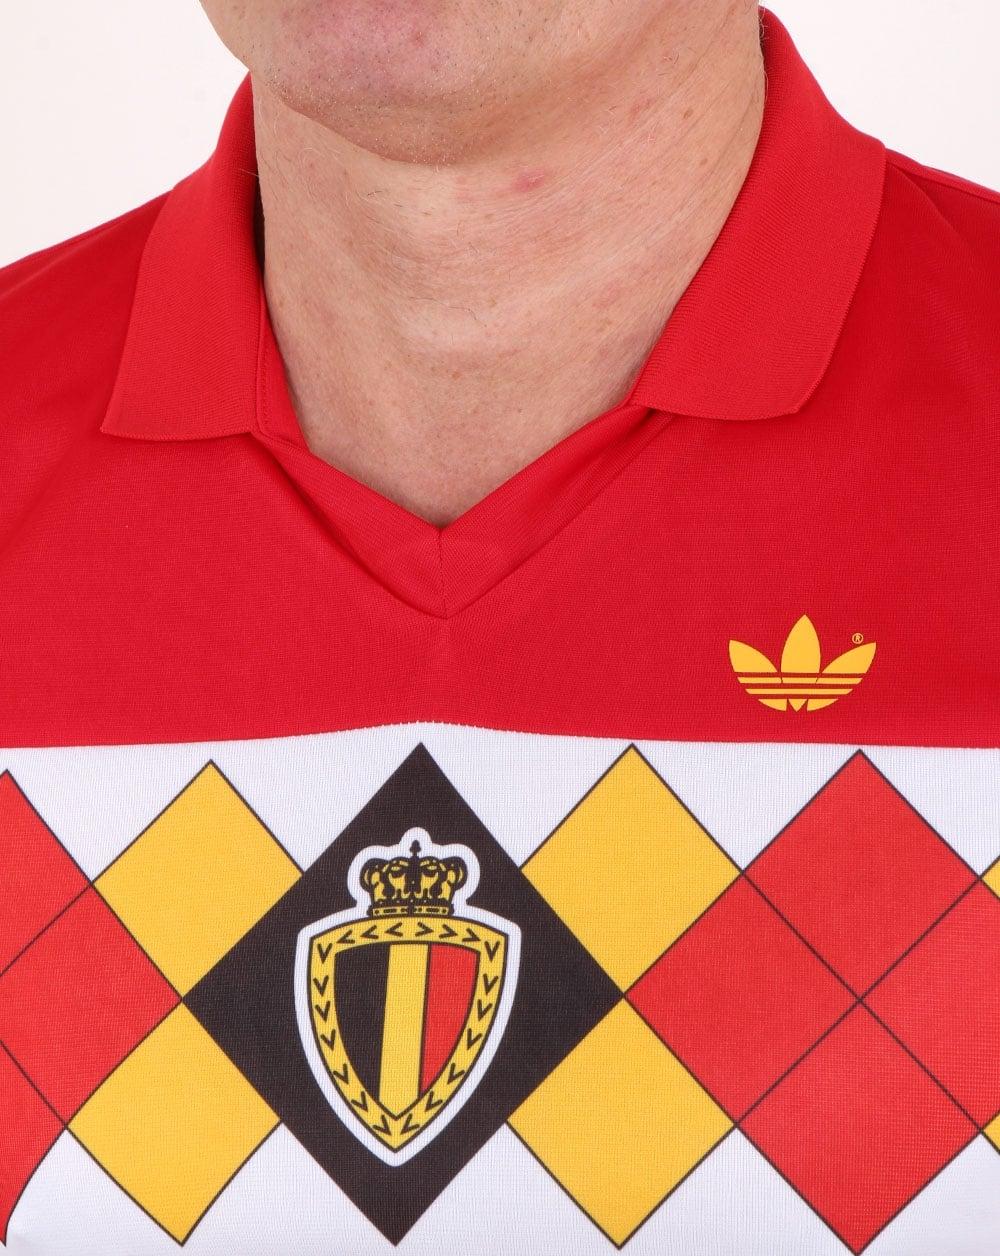 802b10776 Adidas Originals Belgium Jersey Victory Red, Mens, 1984, European